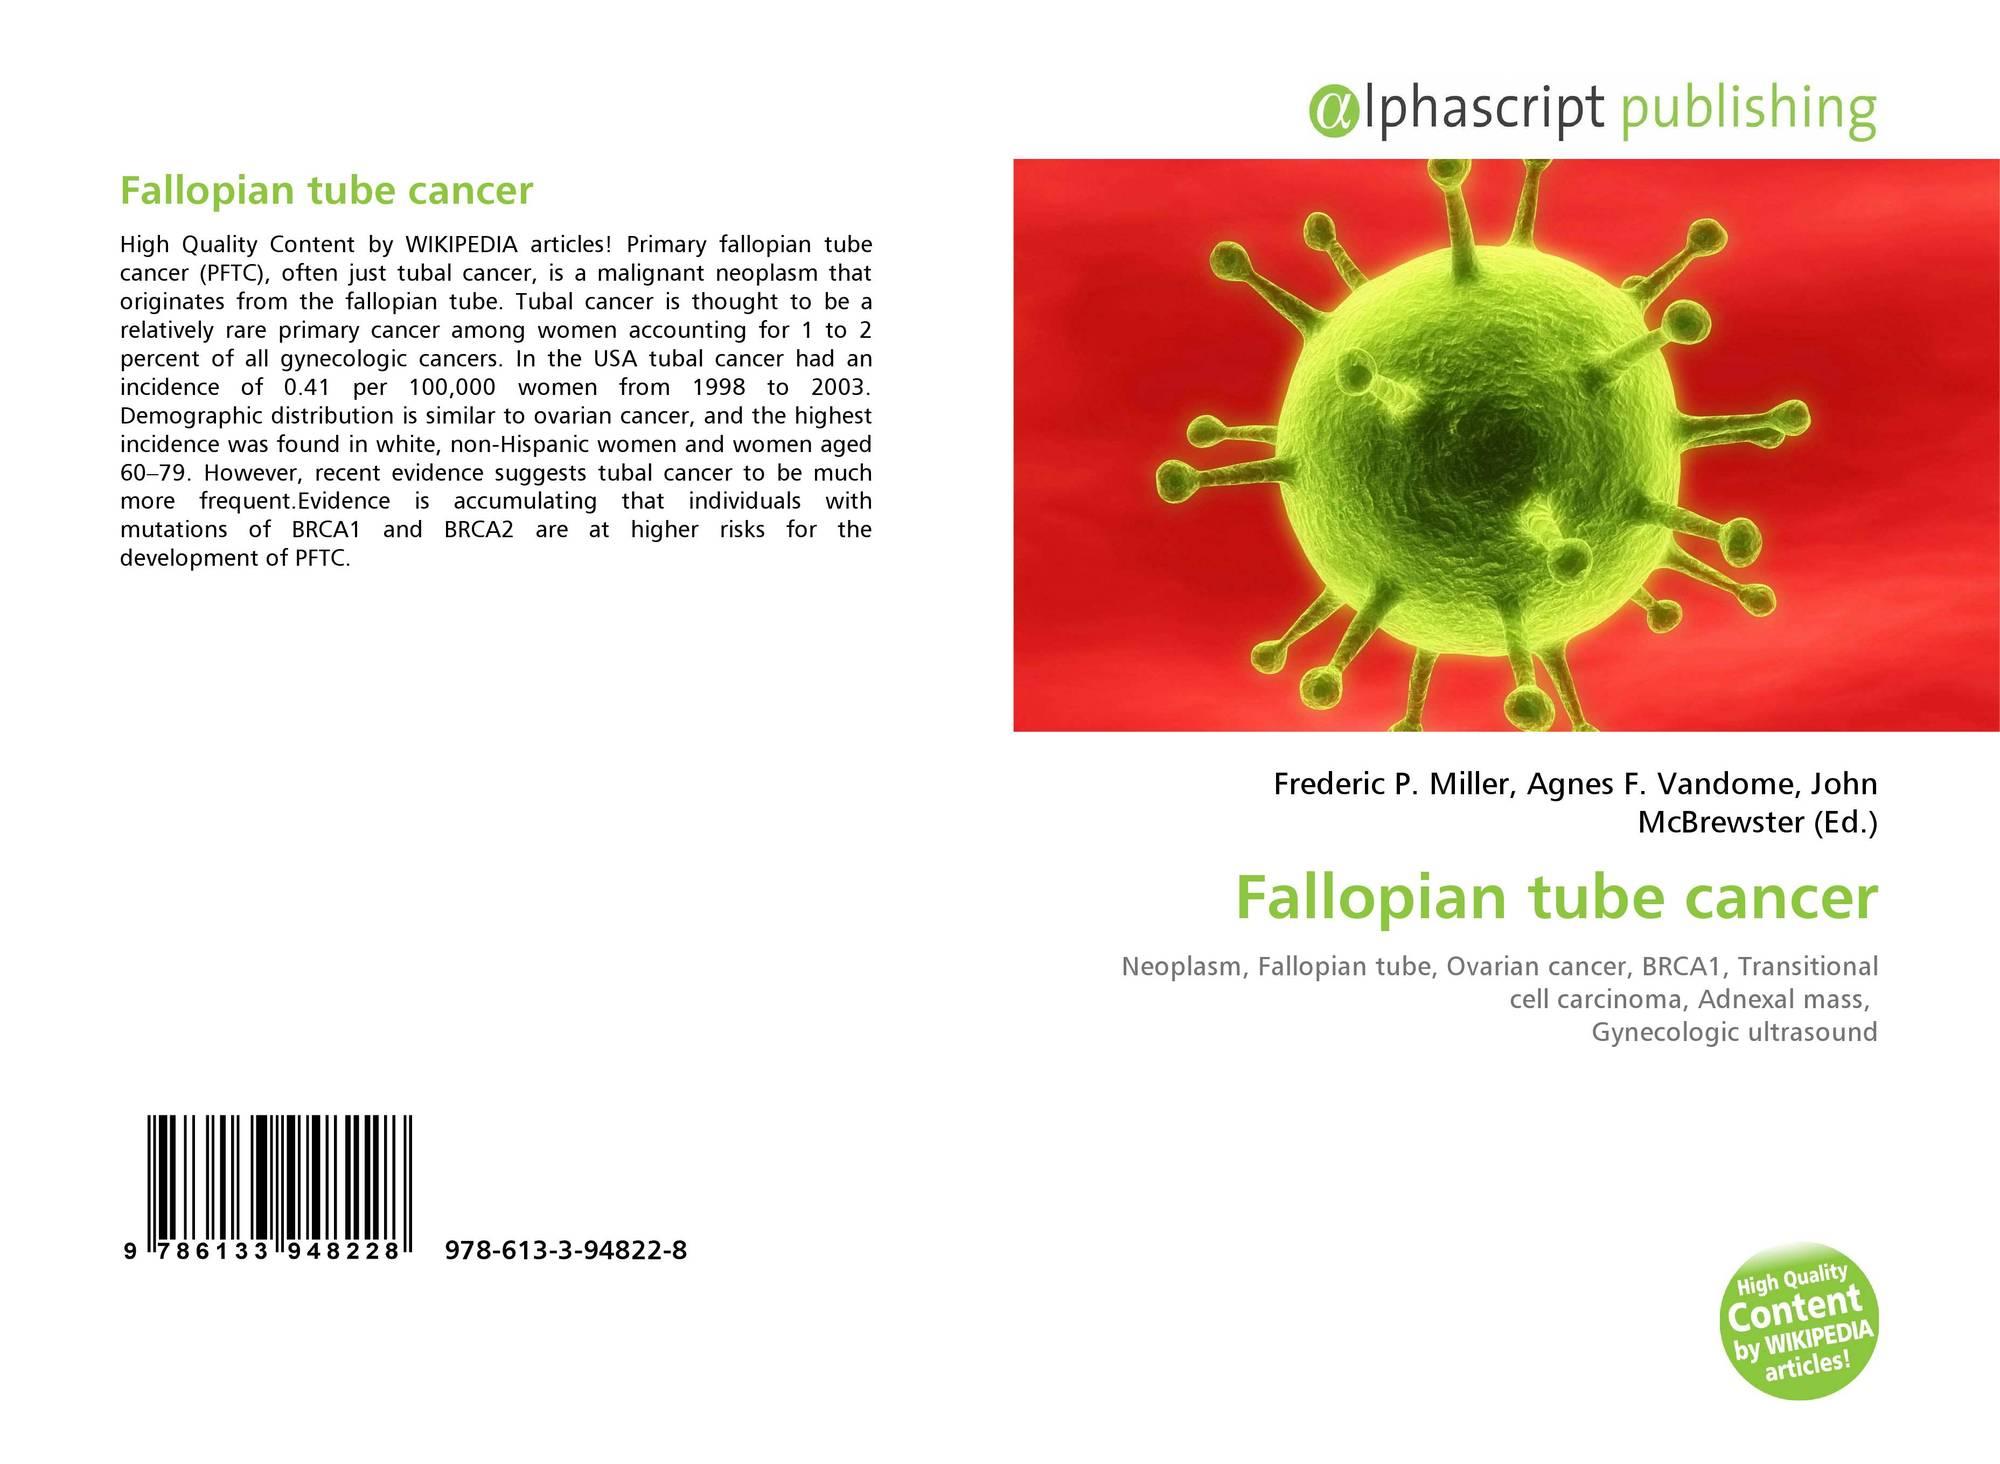 Fallopian tube sperm perfusion